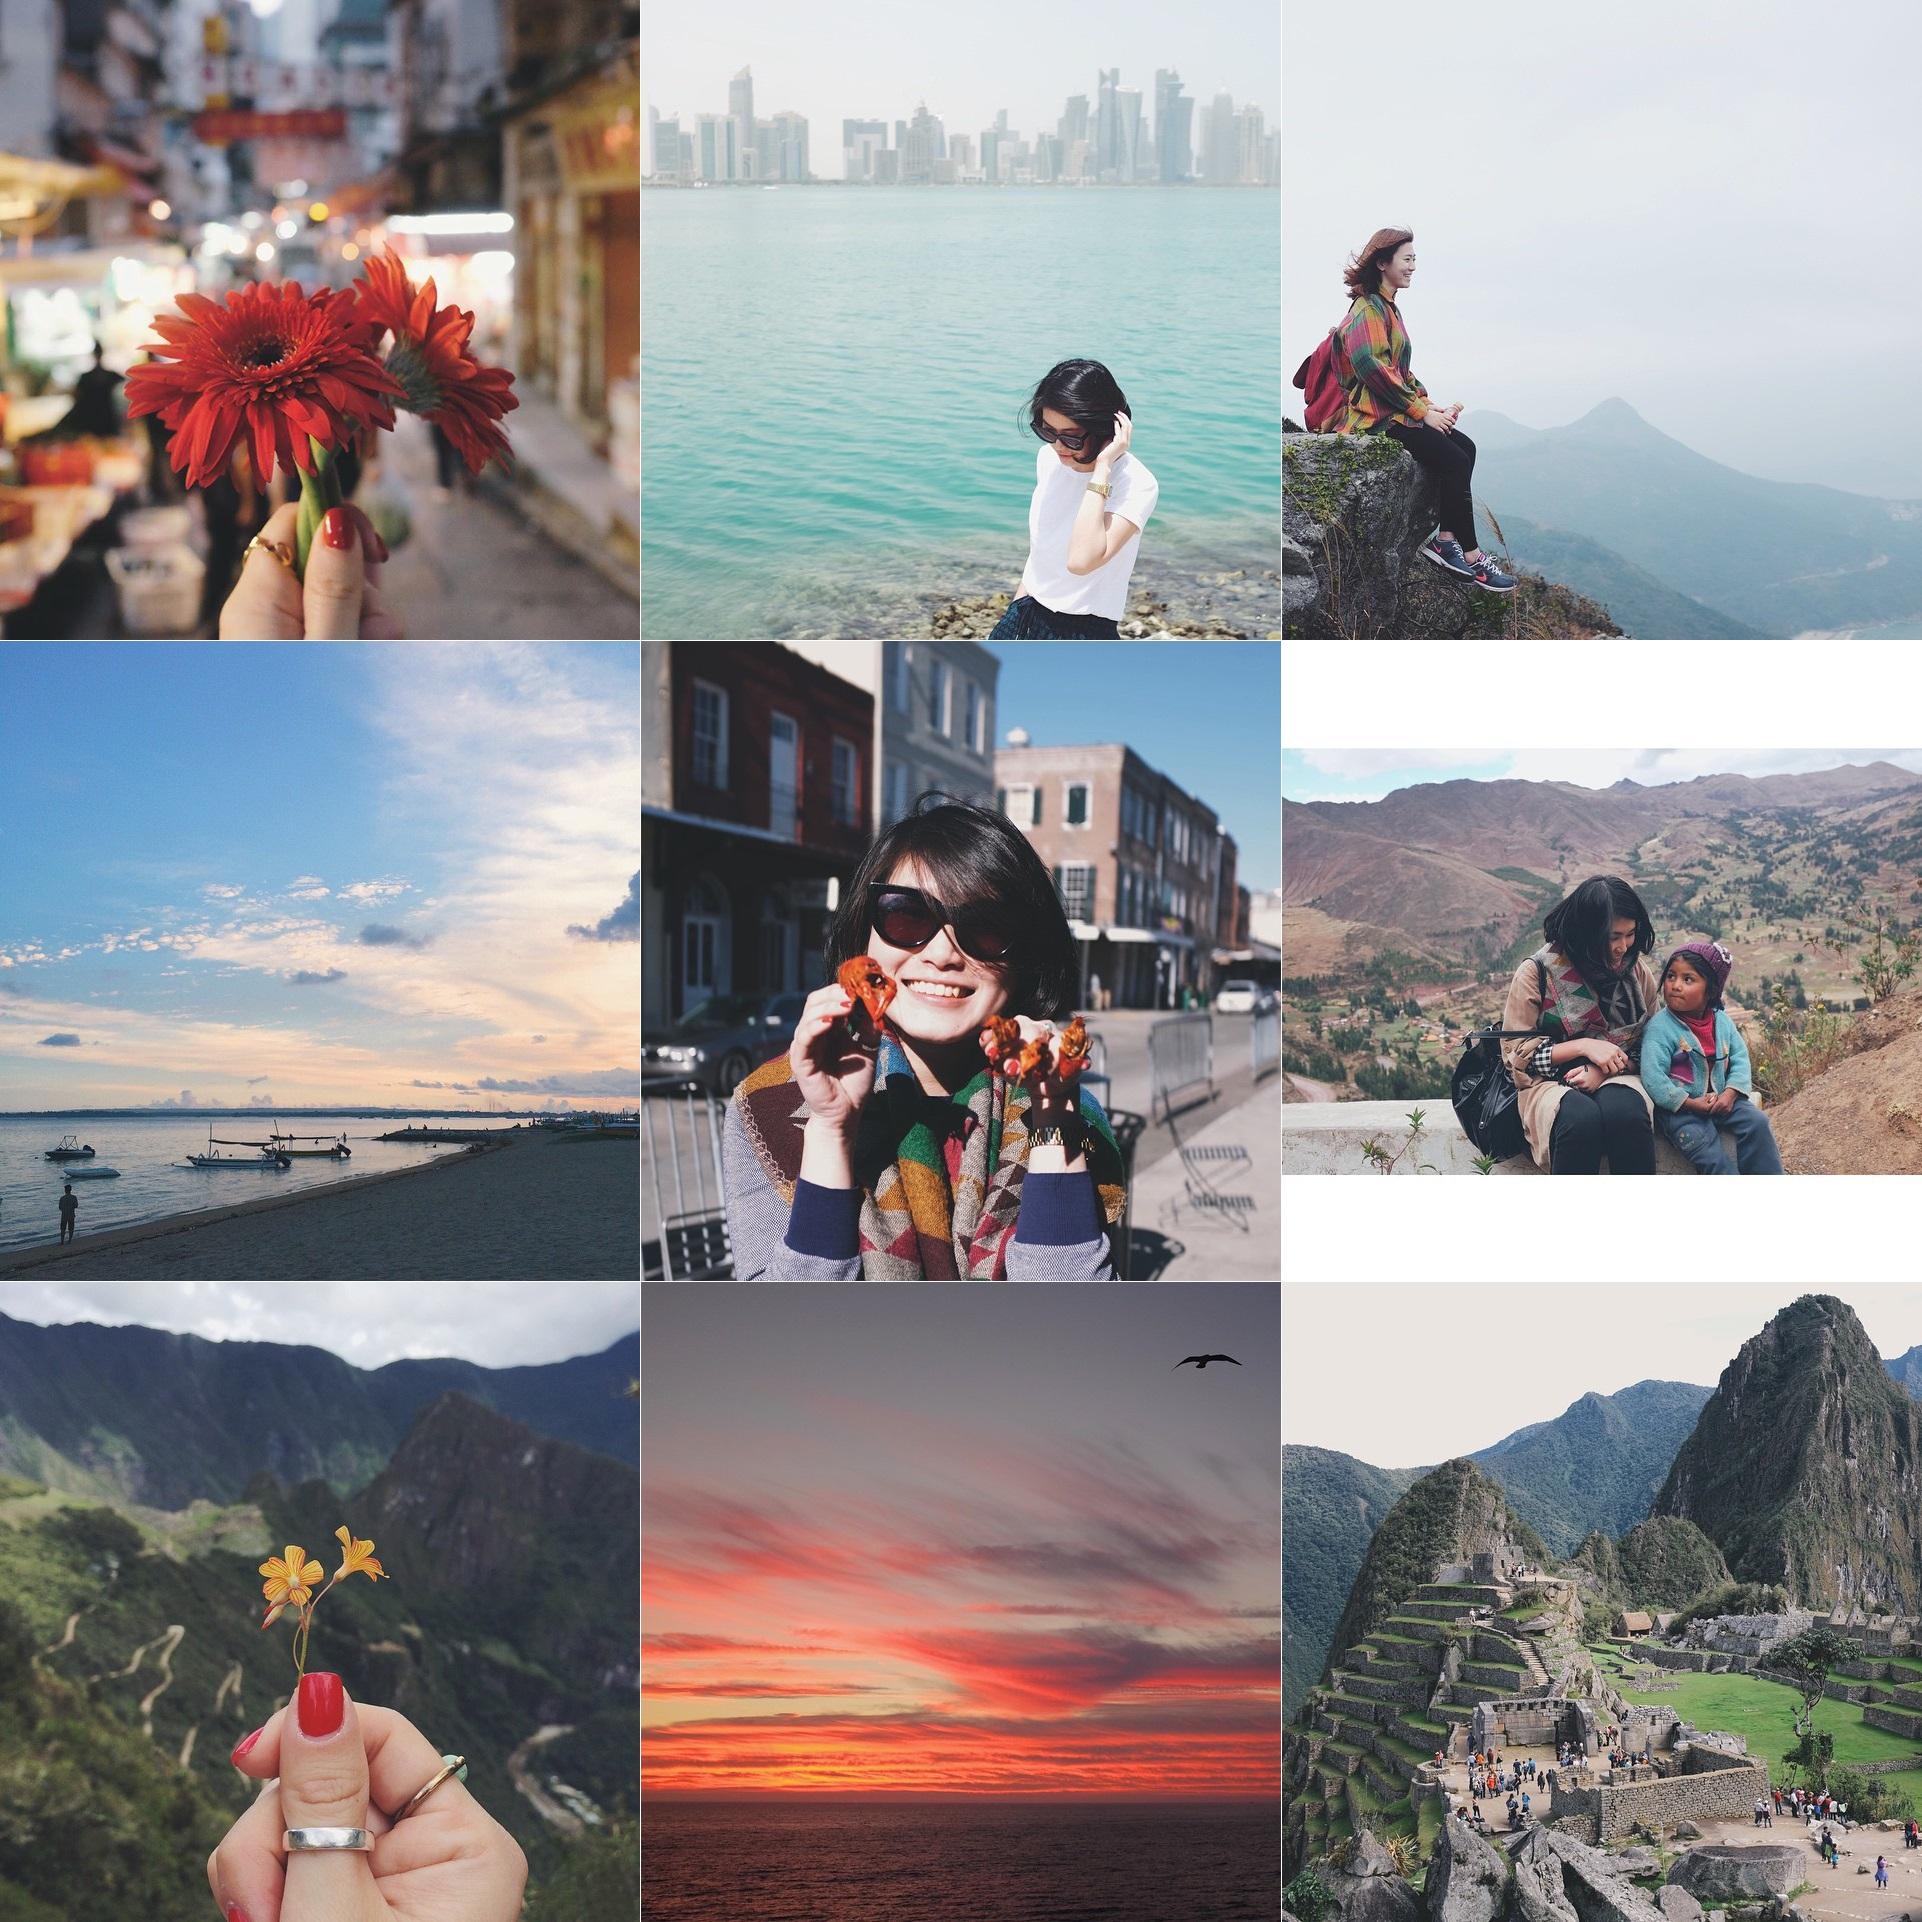 instagram-cliques-seguir-3